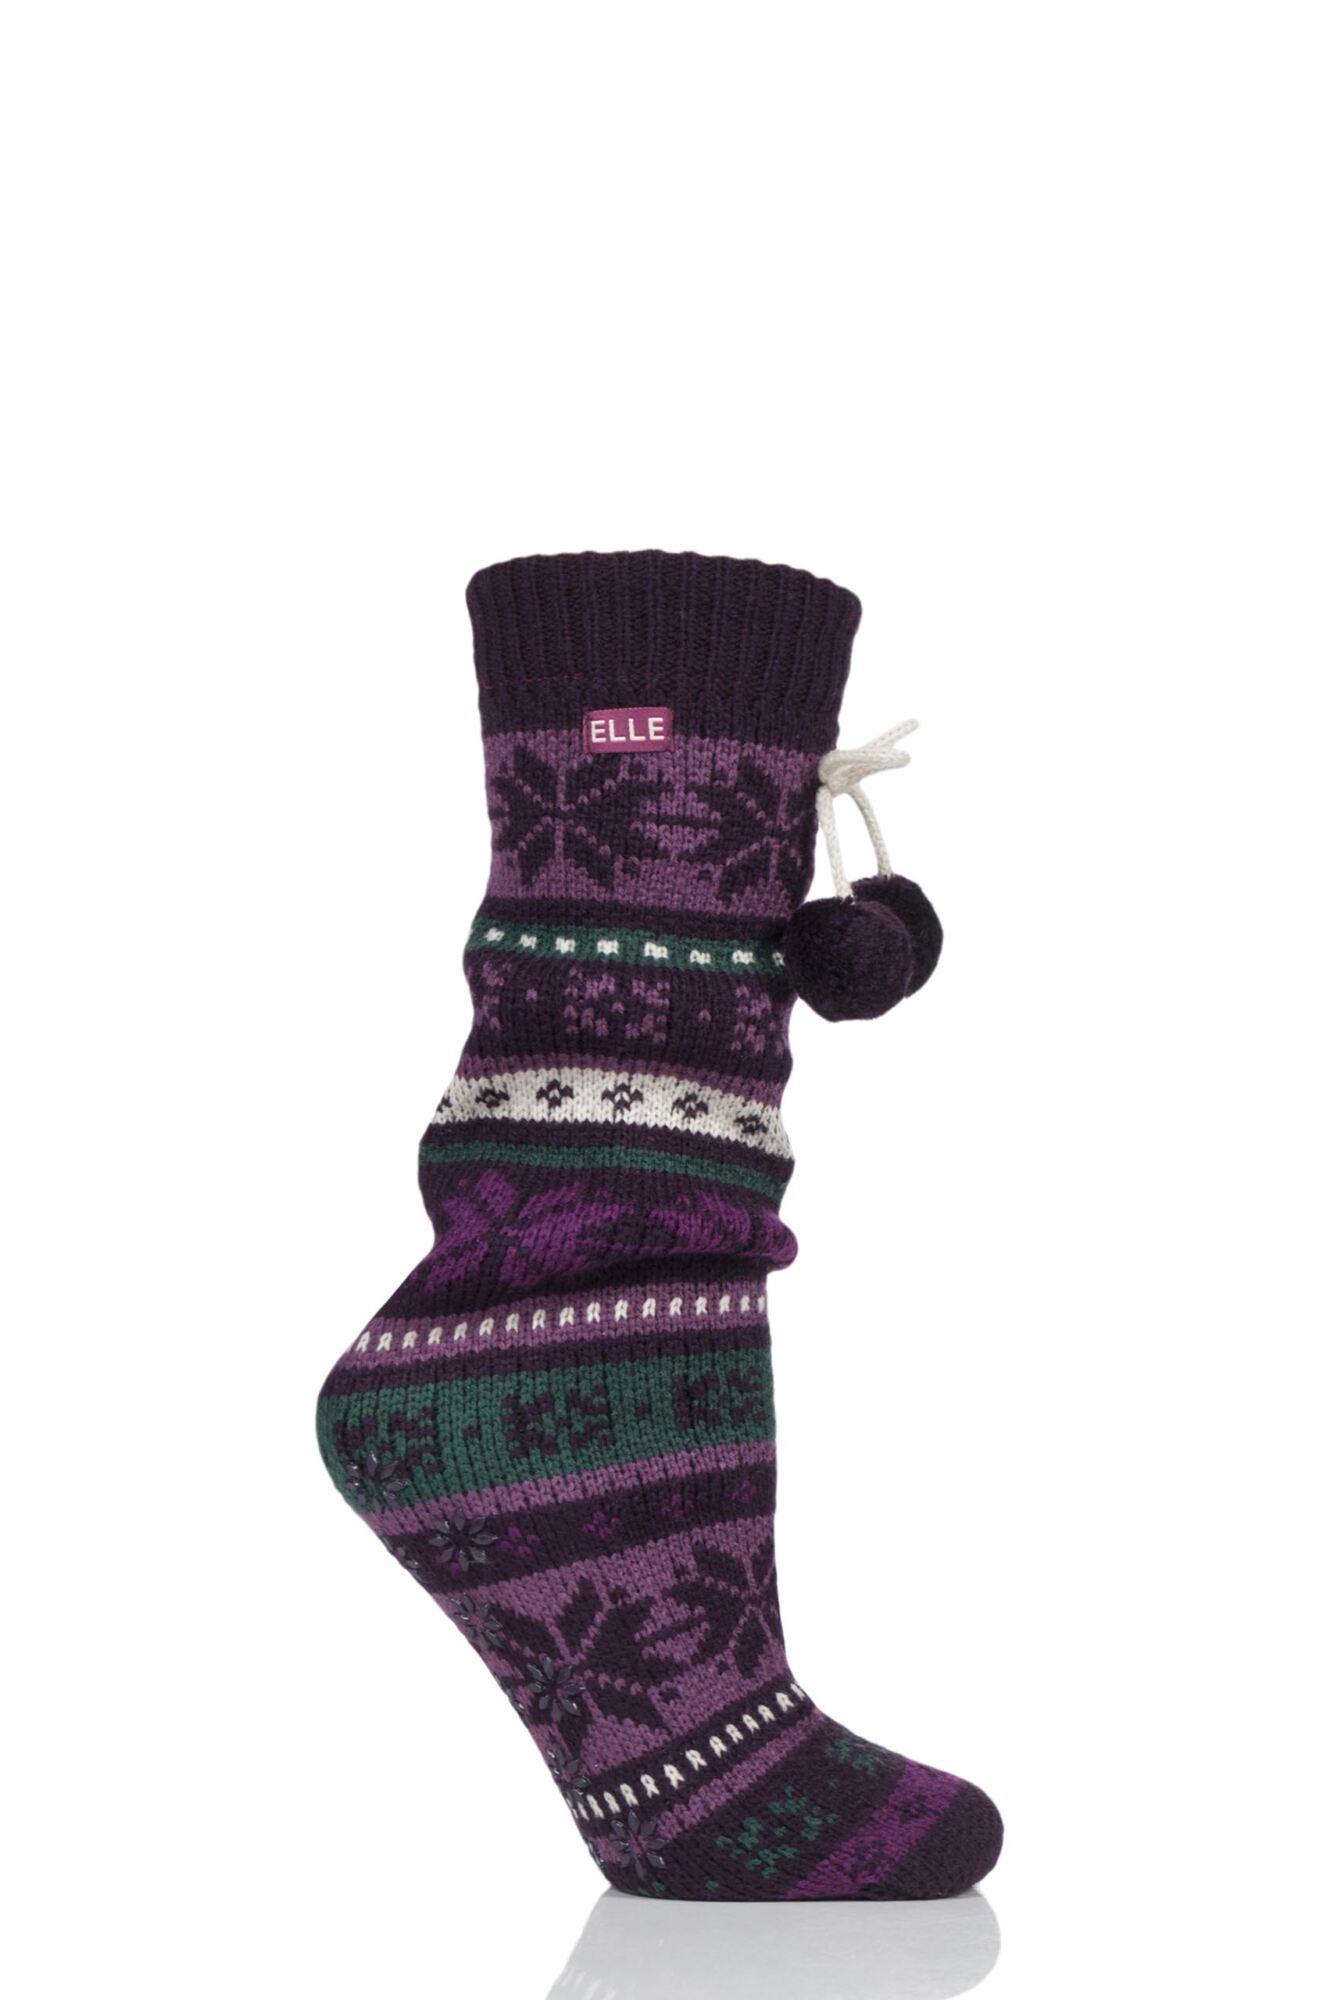 1 Pair Stripe Fairisle Home Knit Bootie Ladies - Elle